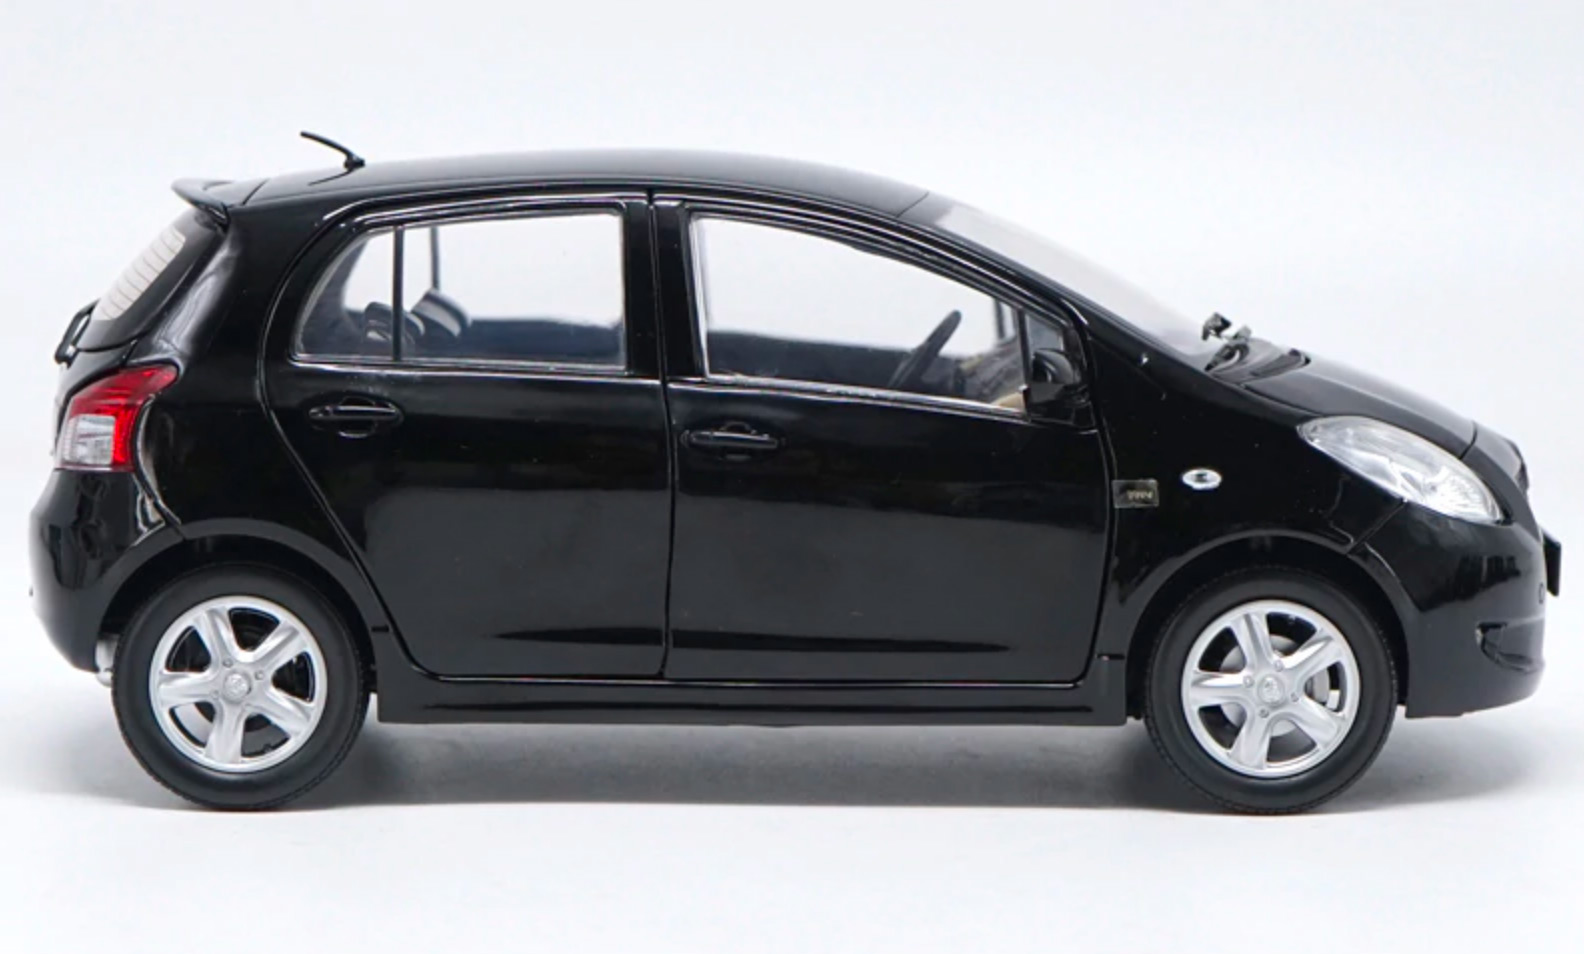 Toyota Yaris Paudi profil